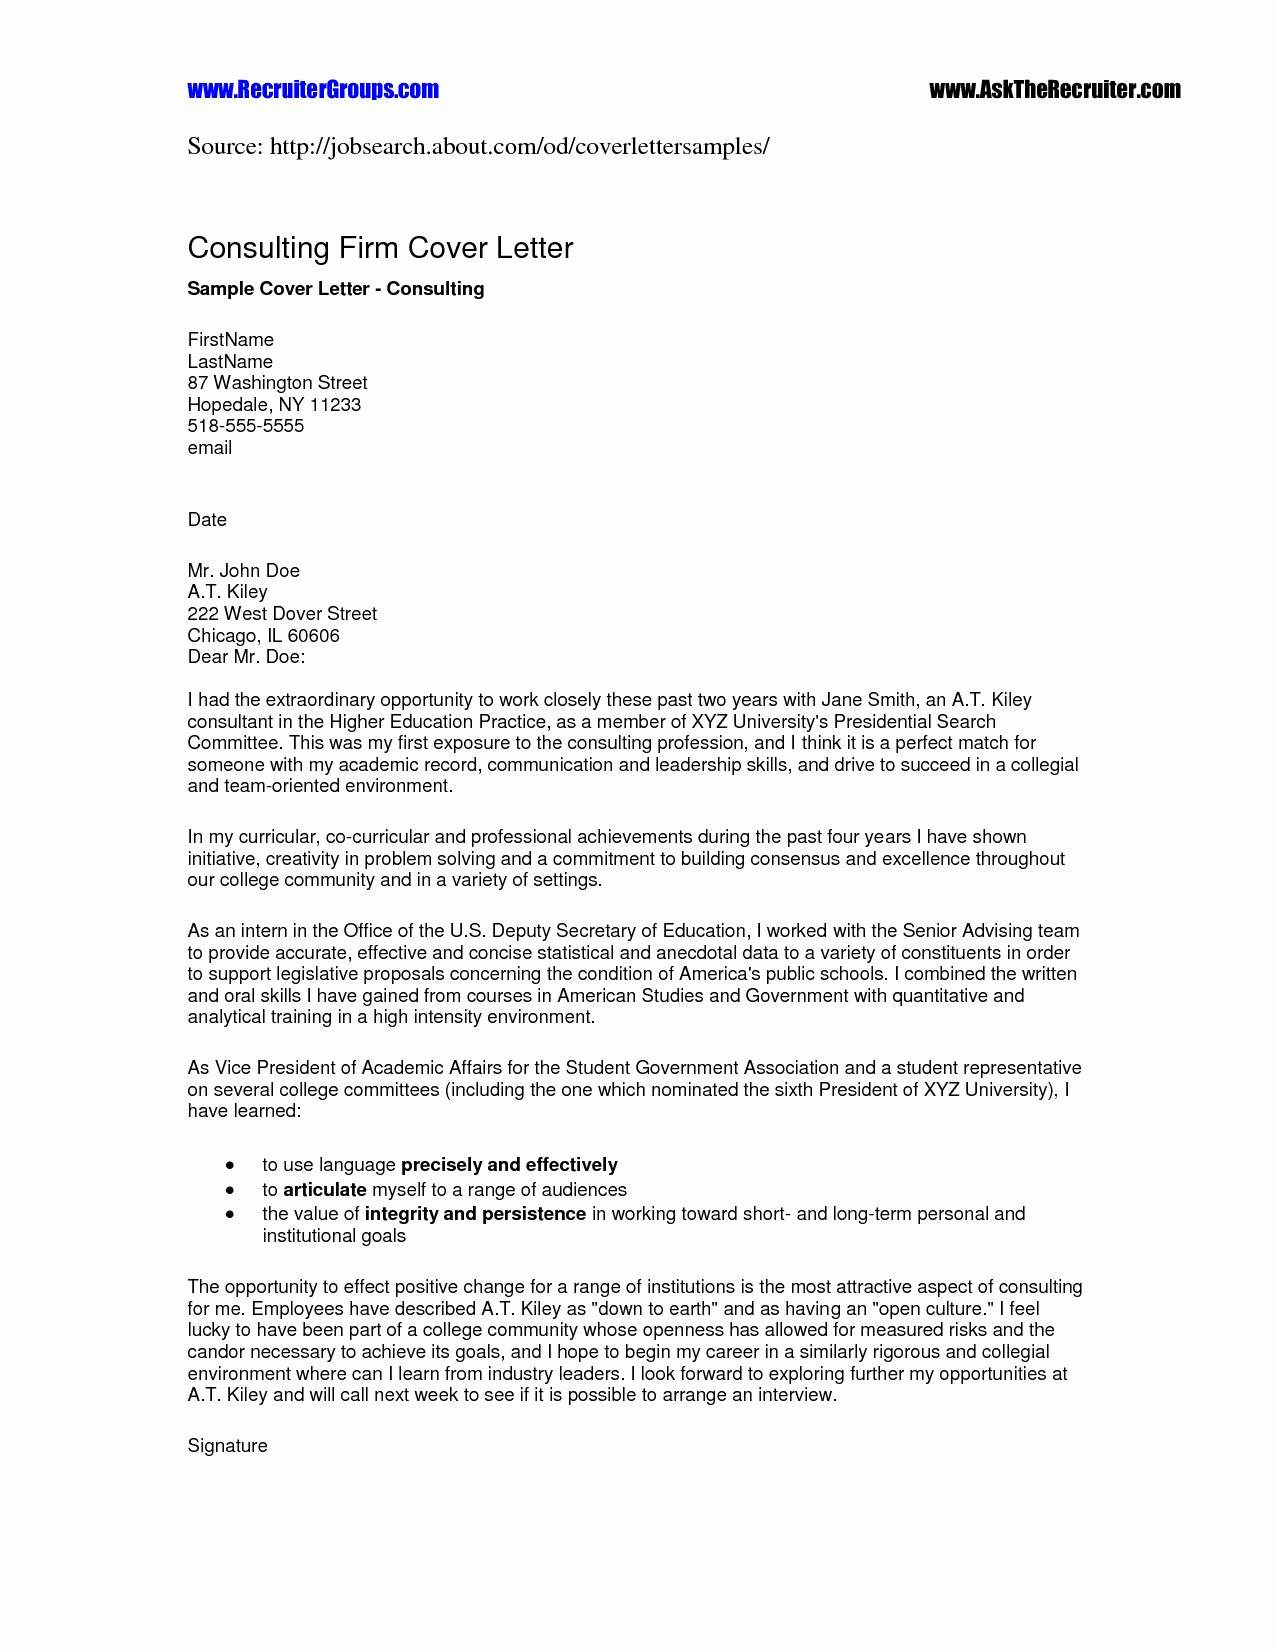 Public Record Removal Letter Template - Employment Fer Letter Template Doc Copy Resignation Letter Sample